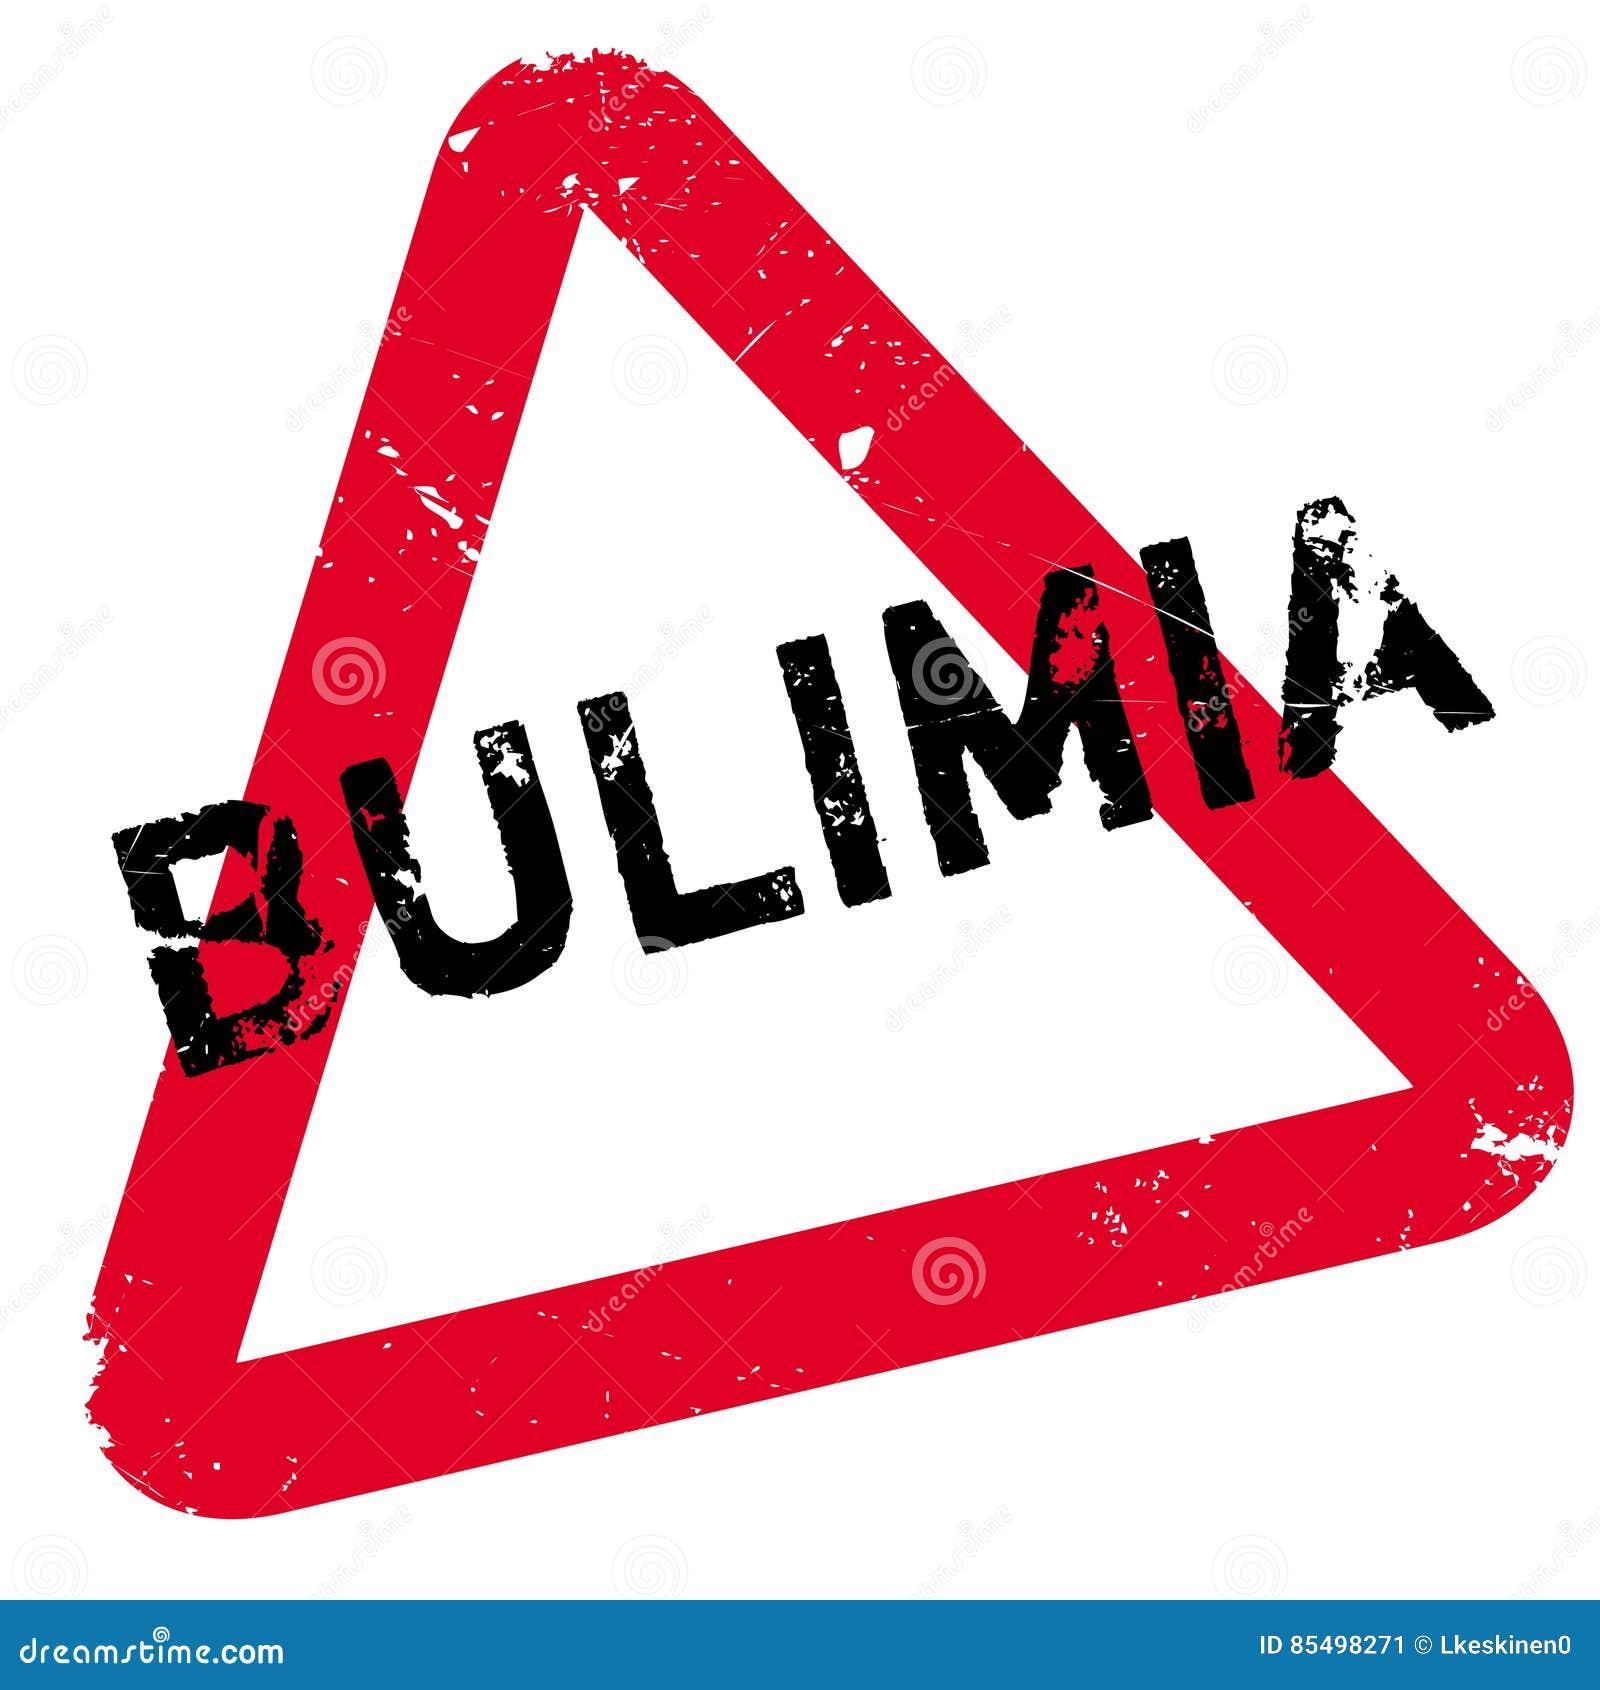 bulimia rubber stamp stock illustration illustration of button